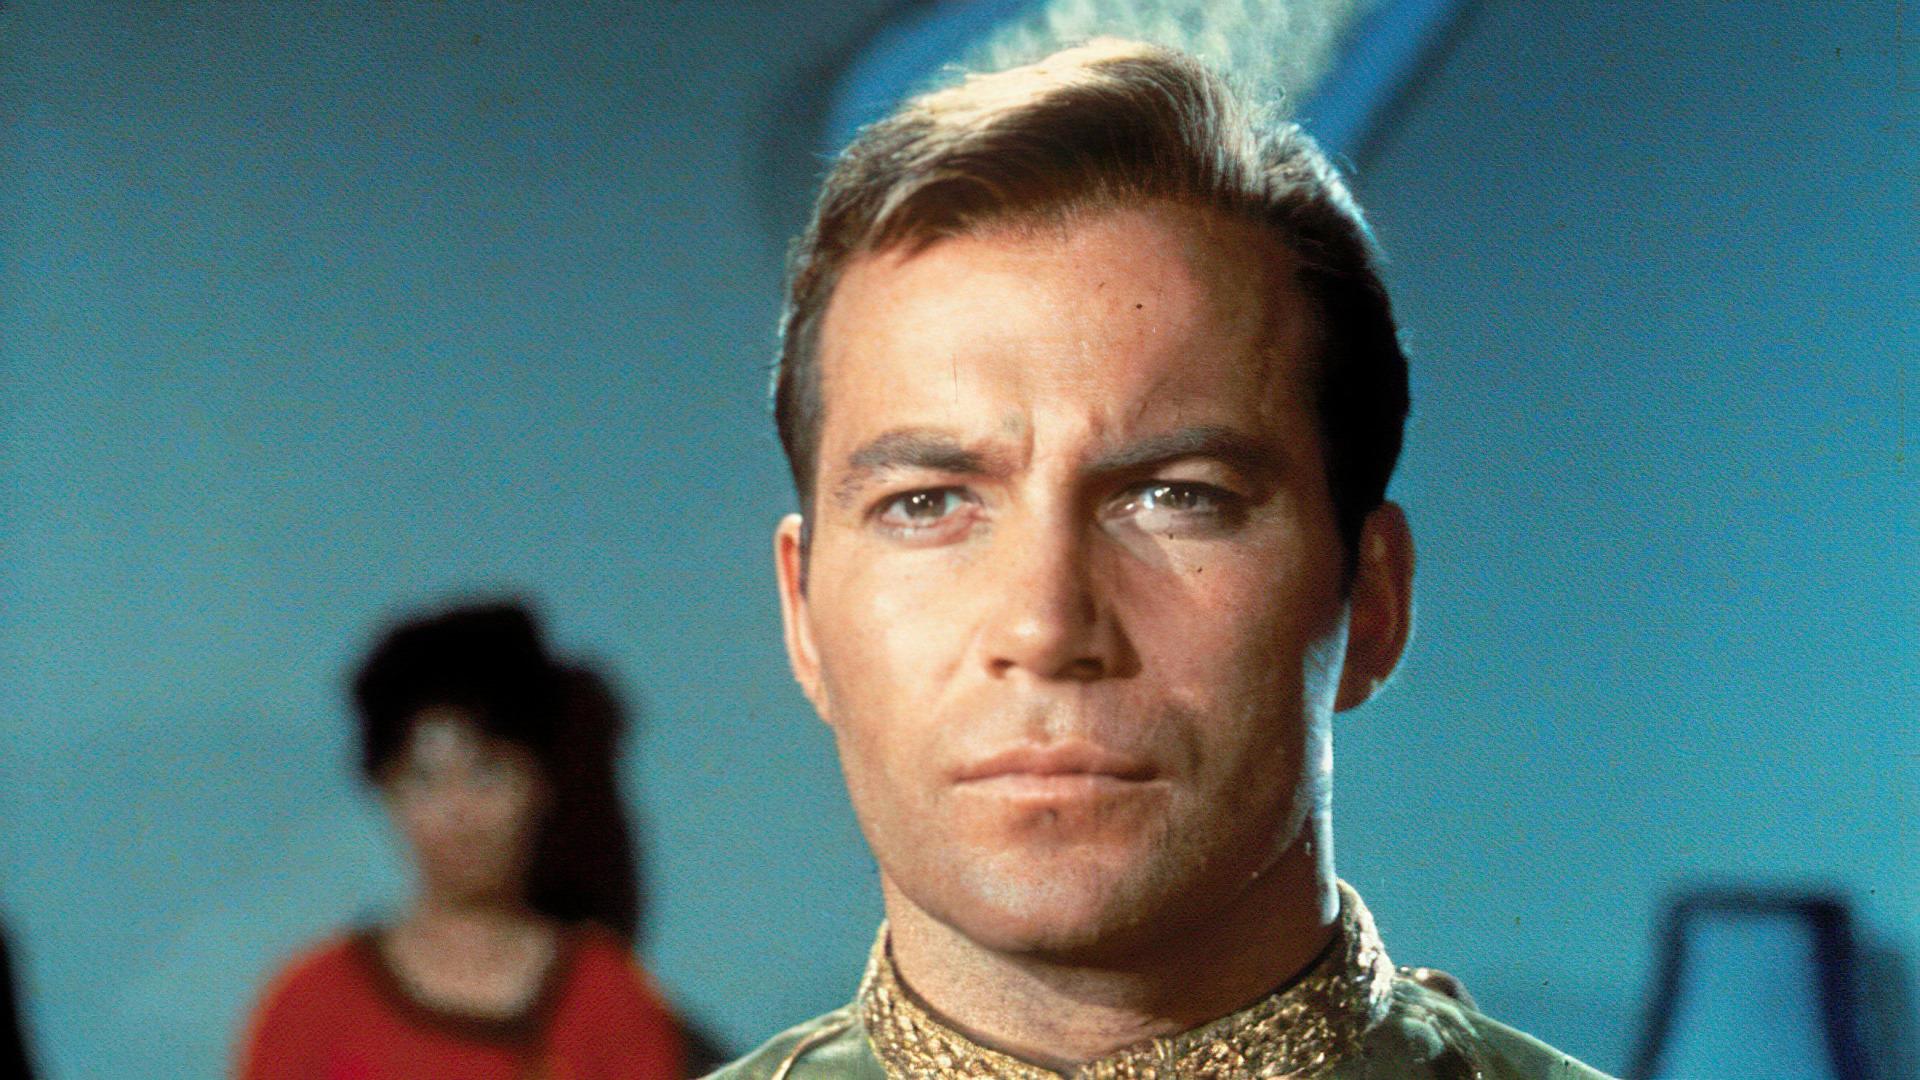 Captain Kirk alias William Shatner fliegt mit Amazon-Chef ins All